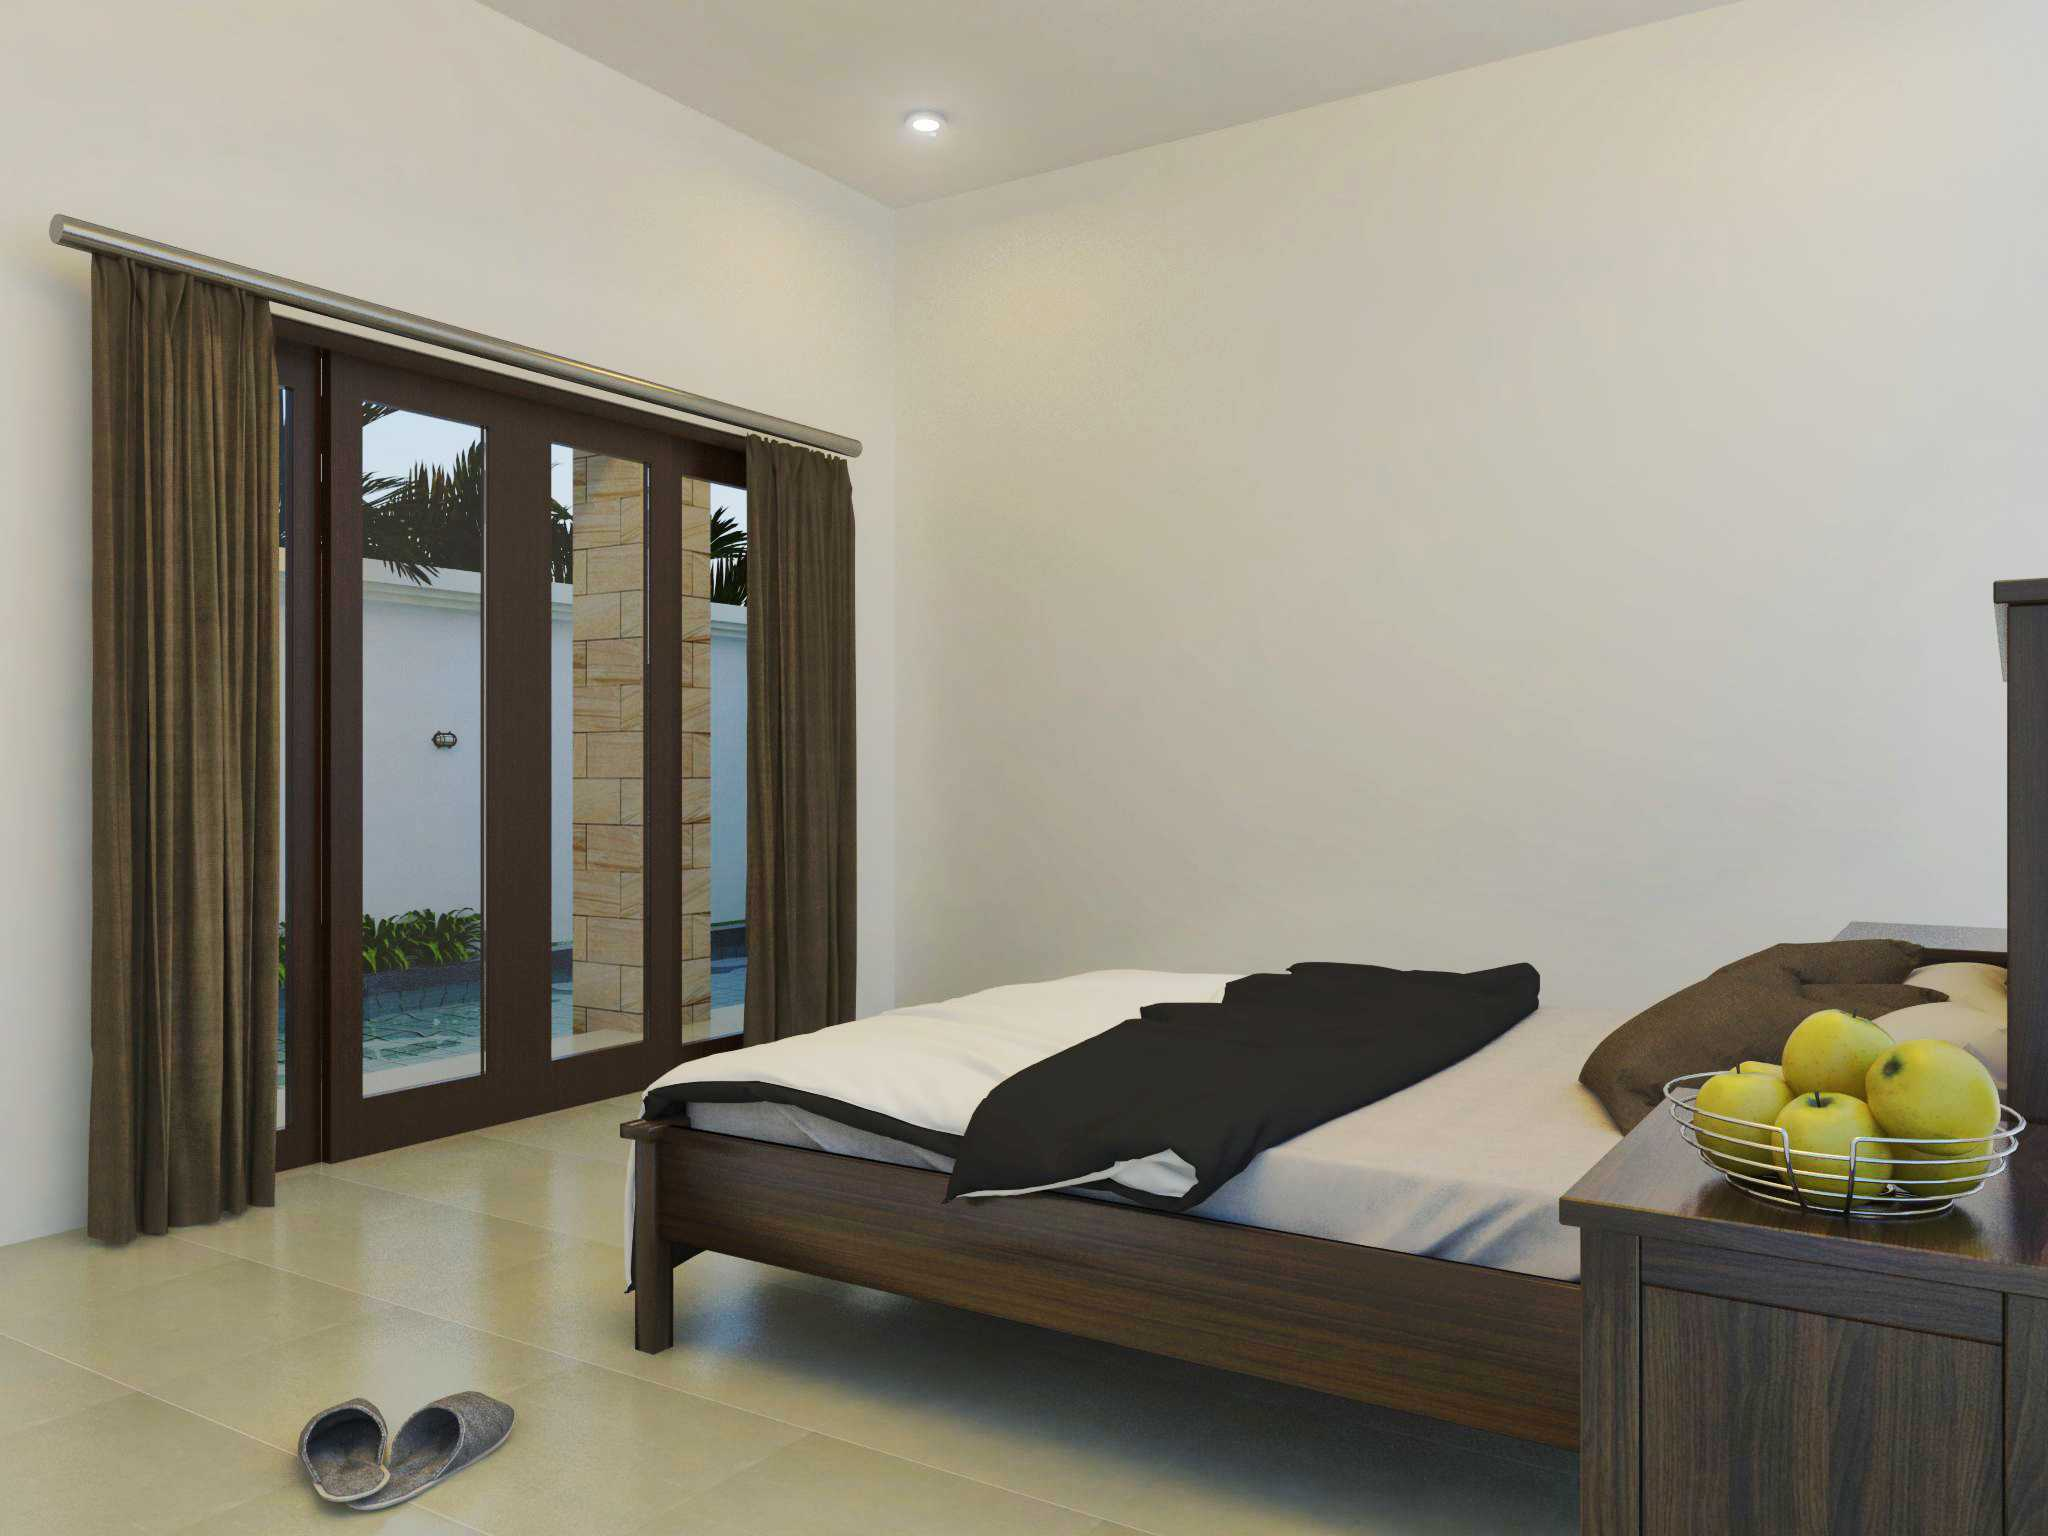 Arsatama Architect Langkung Villa`s - Bali Gianyar, Gianyar Sub-District, Gianyar, Bali, Indonesia Bali, Indonesia Bed-Roomlangkung-Villas   23618